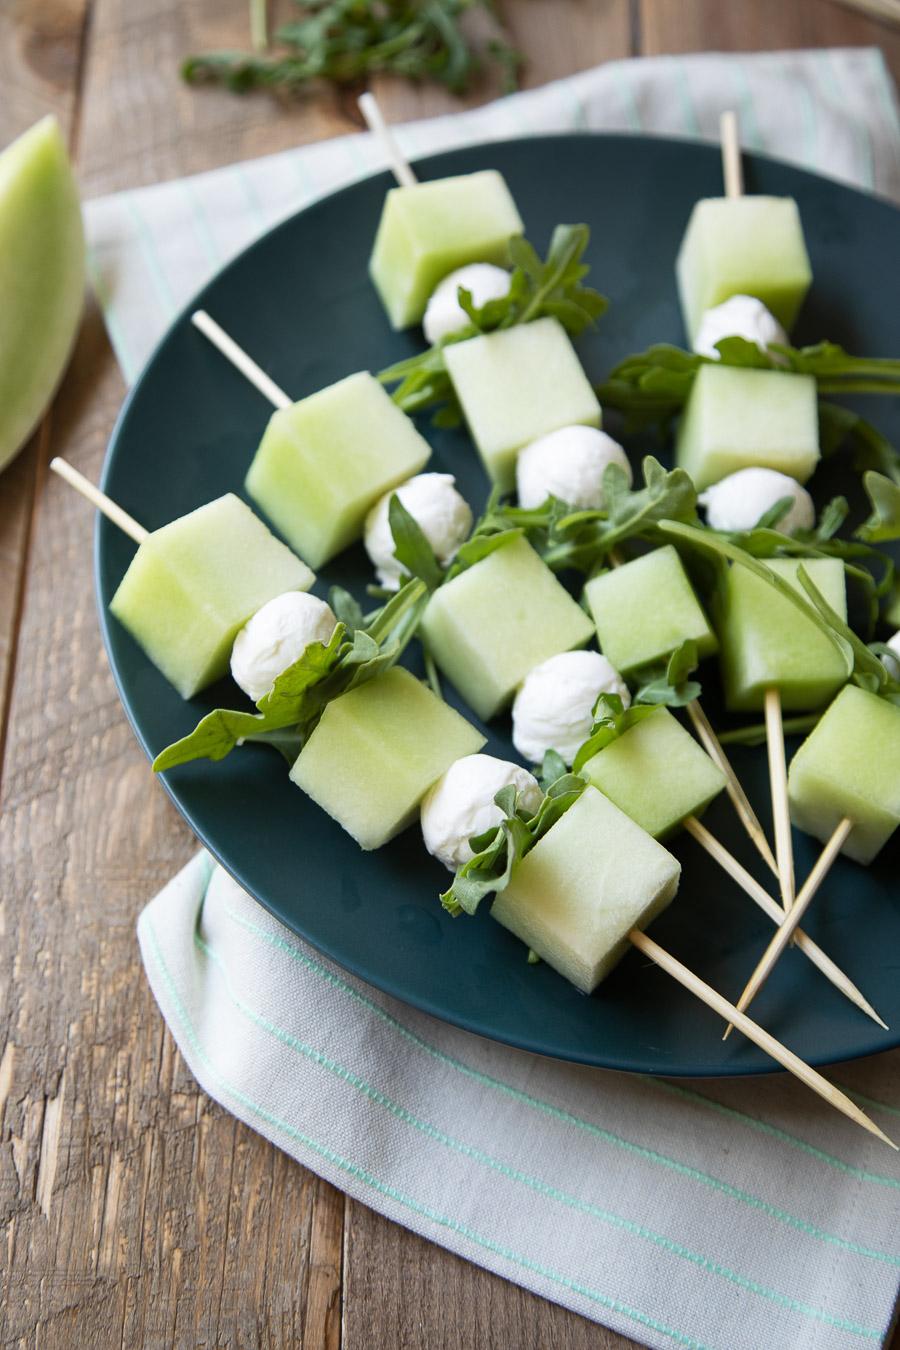 Honeydew Melon Appetizer Skewers